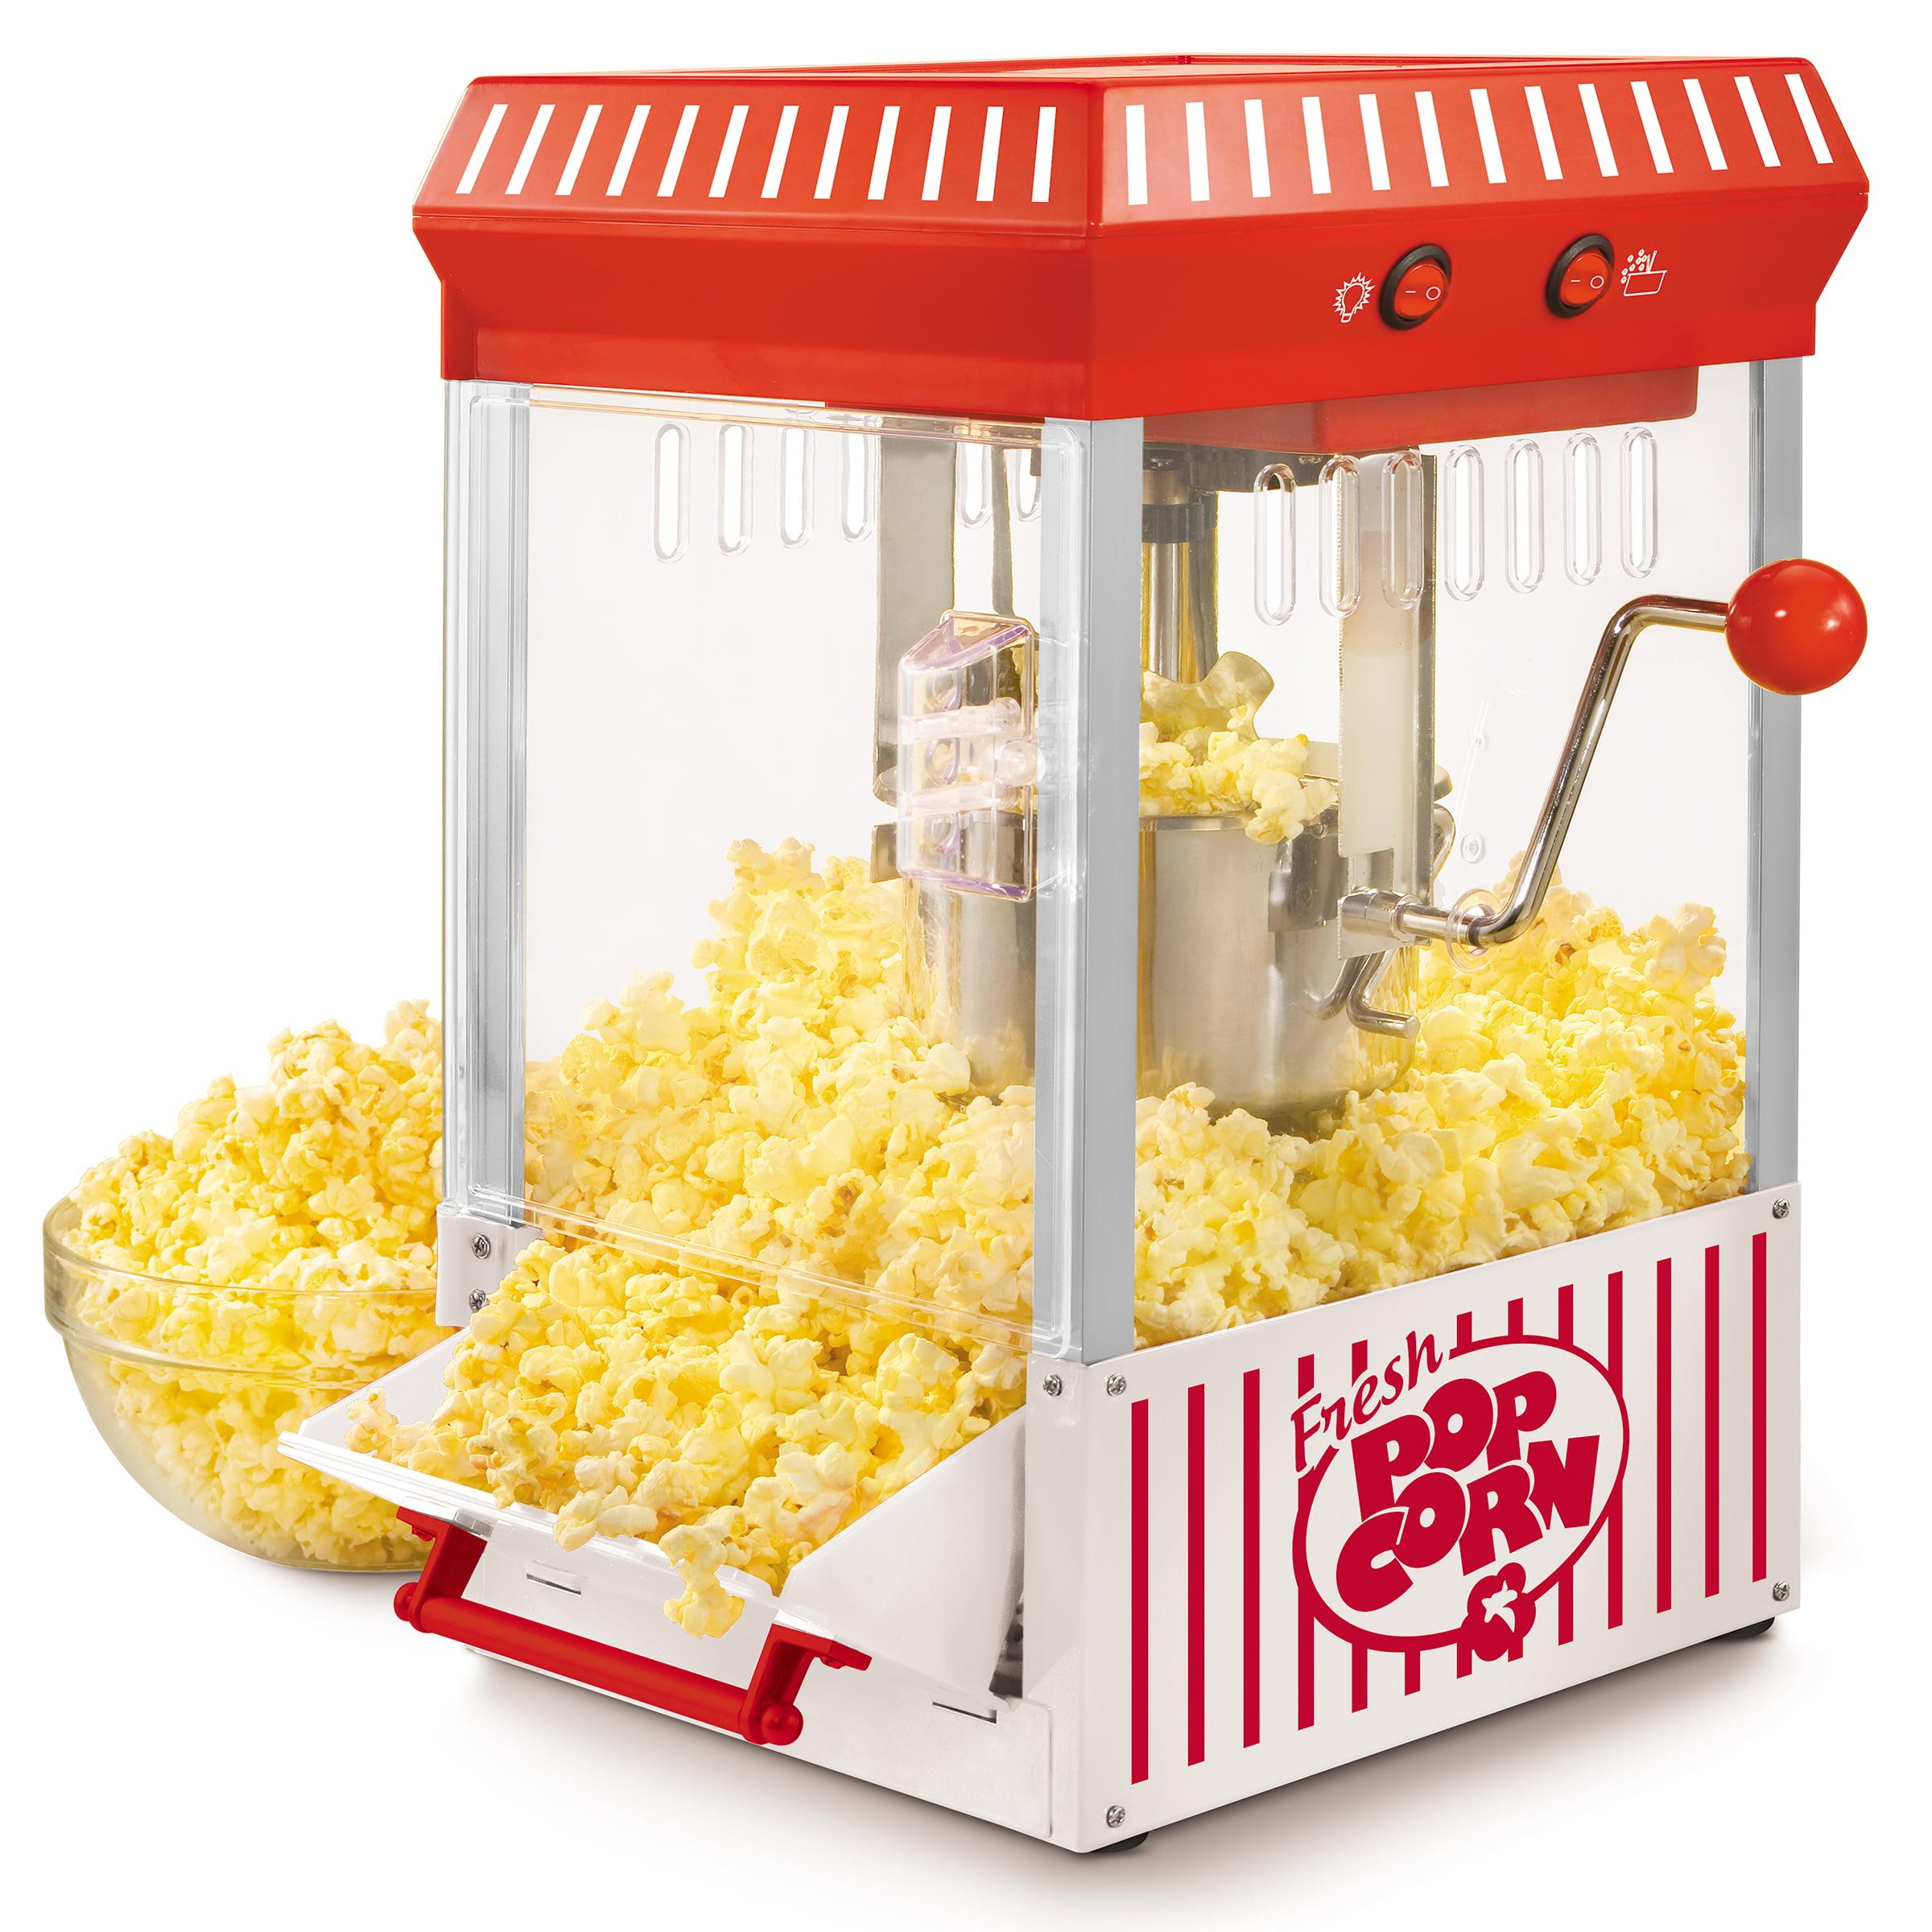 Nostalgia Kpm200 2 5 Ounce Tabletop Kettle Popcorn Maker Makes 10